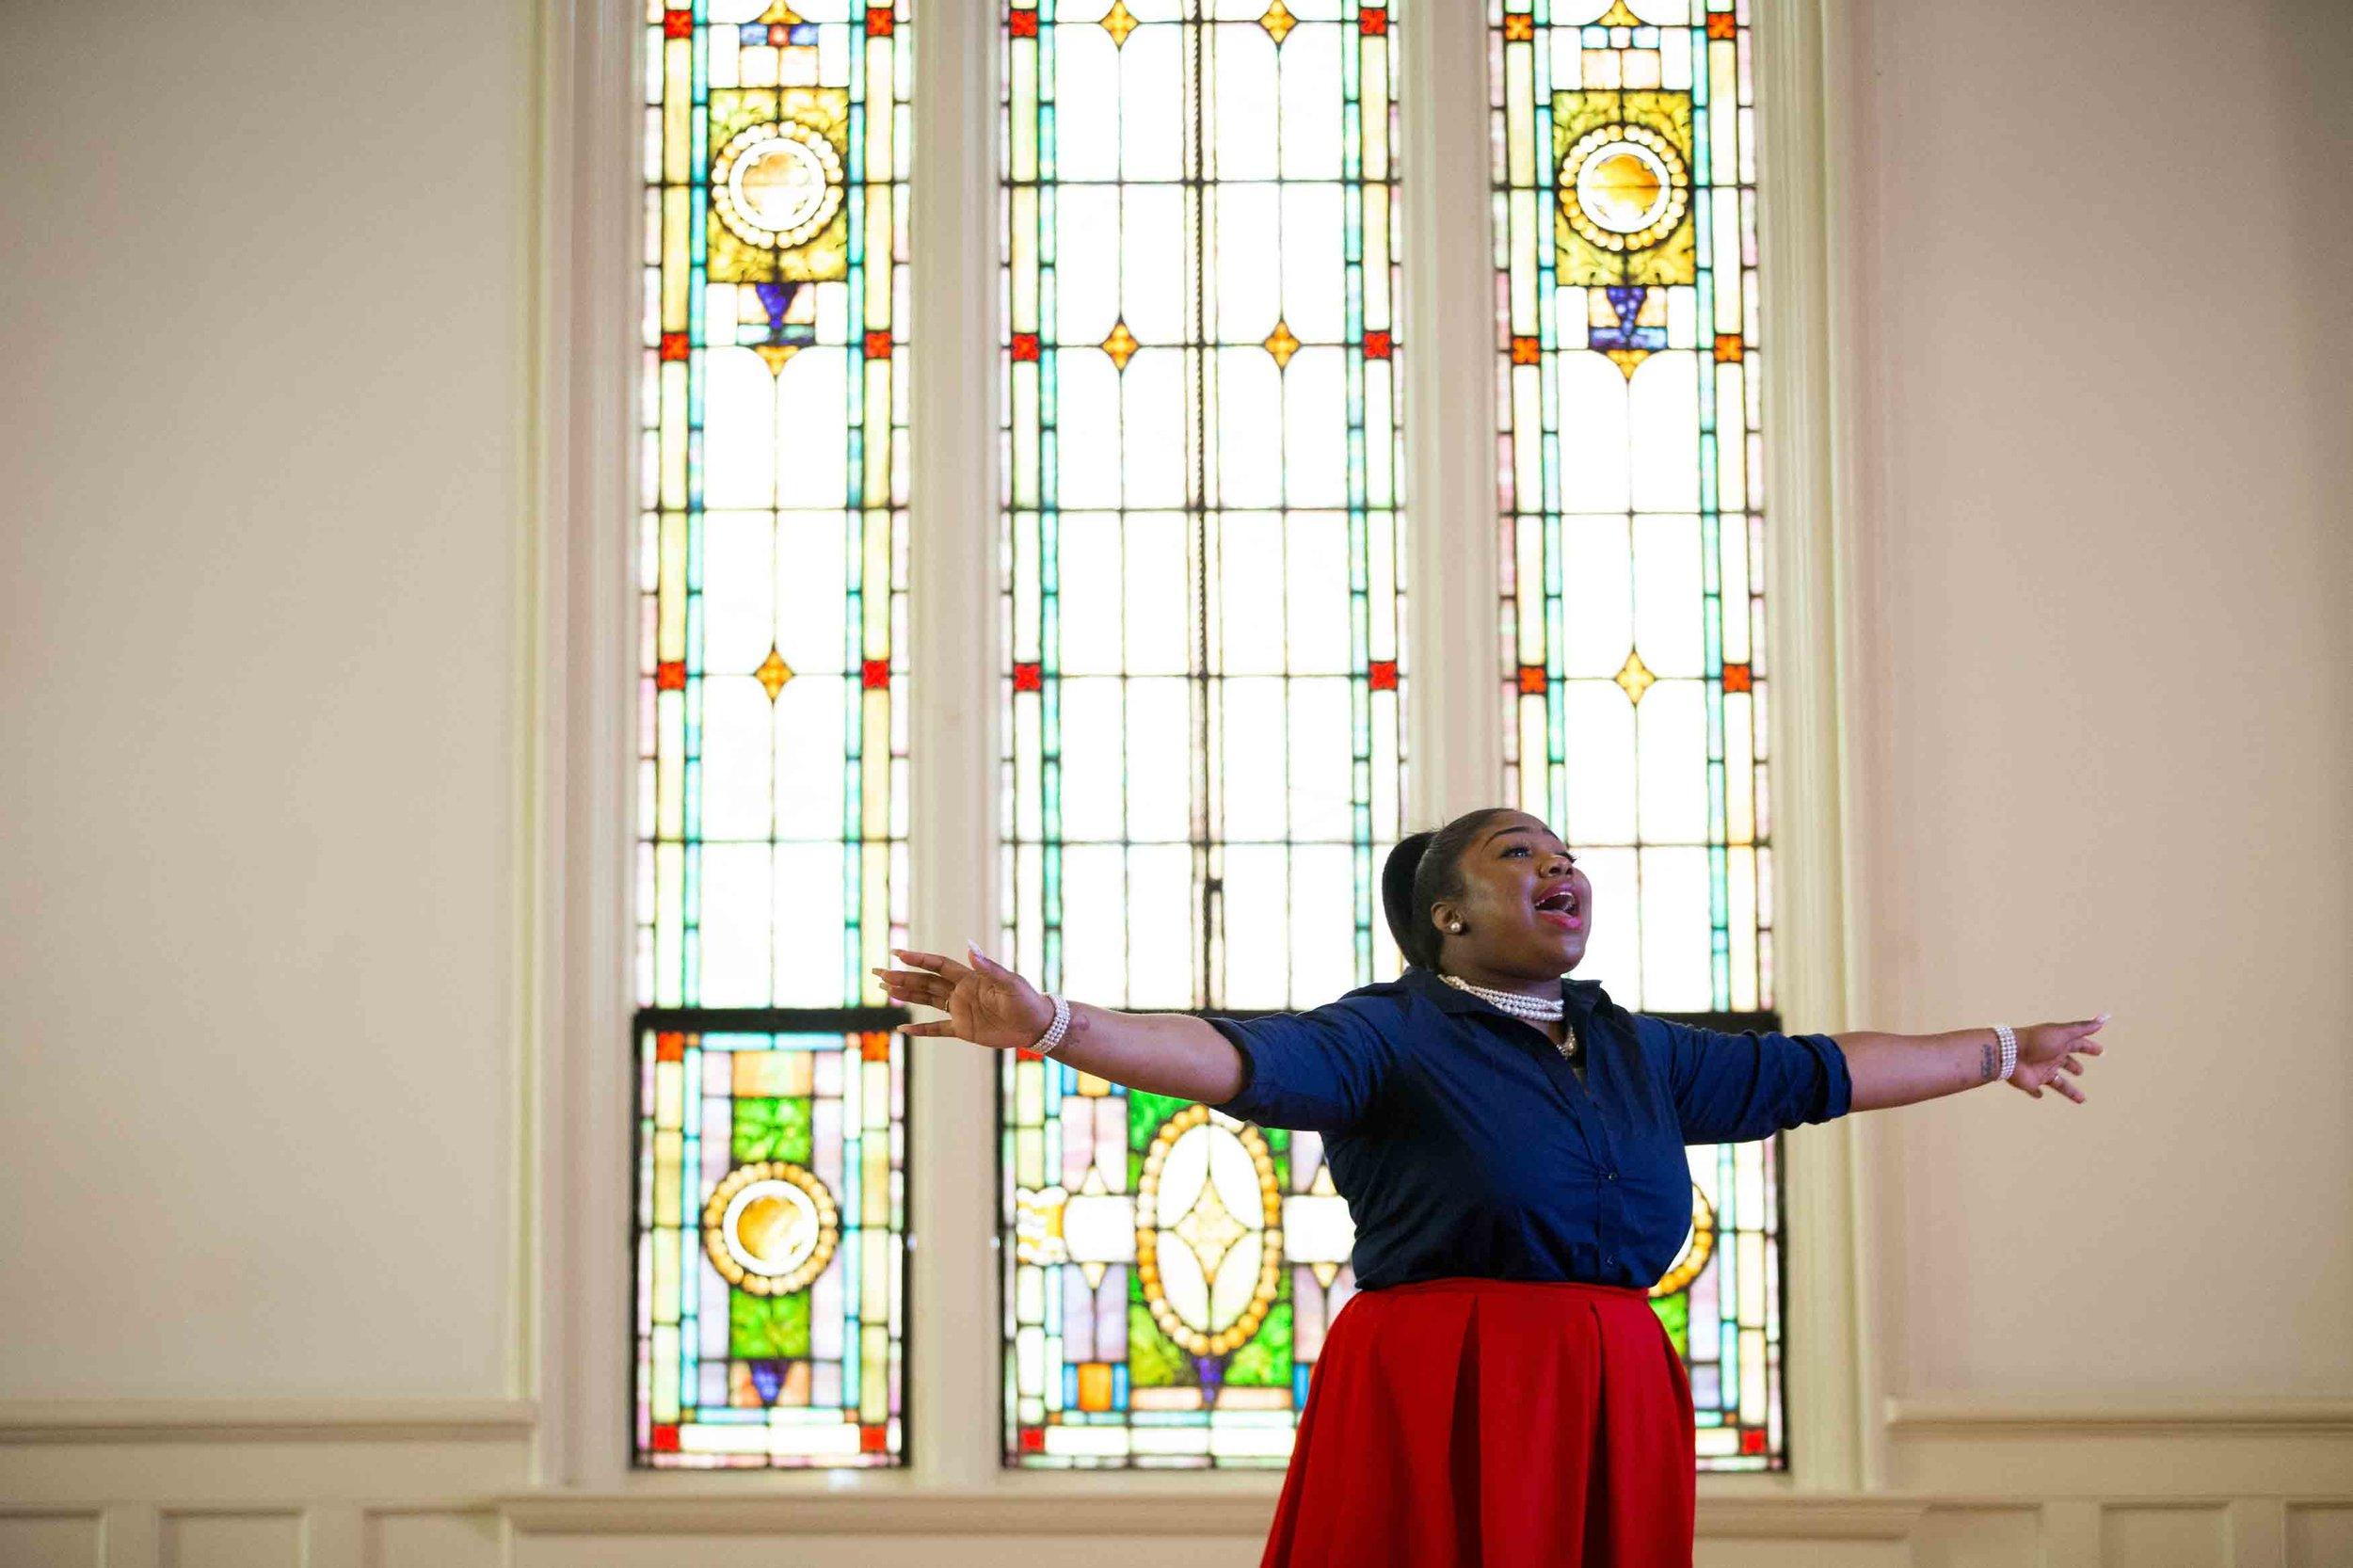 Octavia Jones reacts as pastor Billy Honor preaches during a church service at Pulse Church, Sunday, Nov. 13, 2016, in Atlanta.    Branden Camp / for NBC News